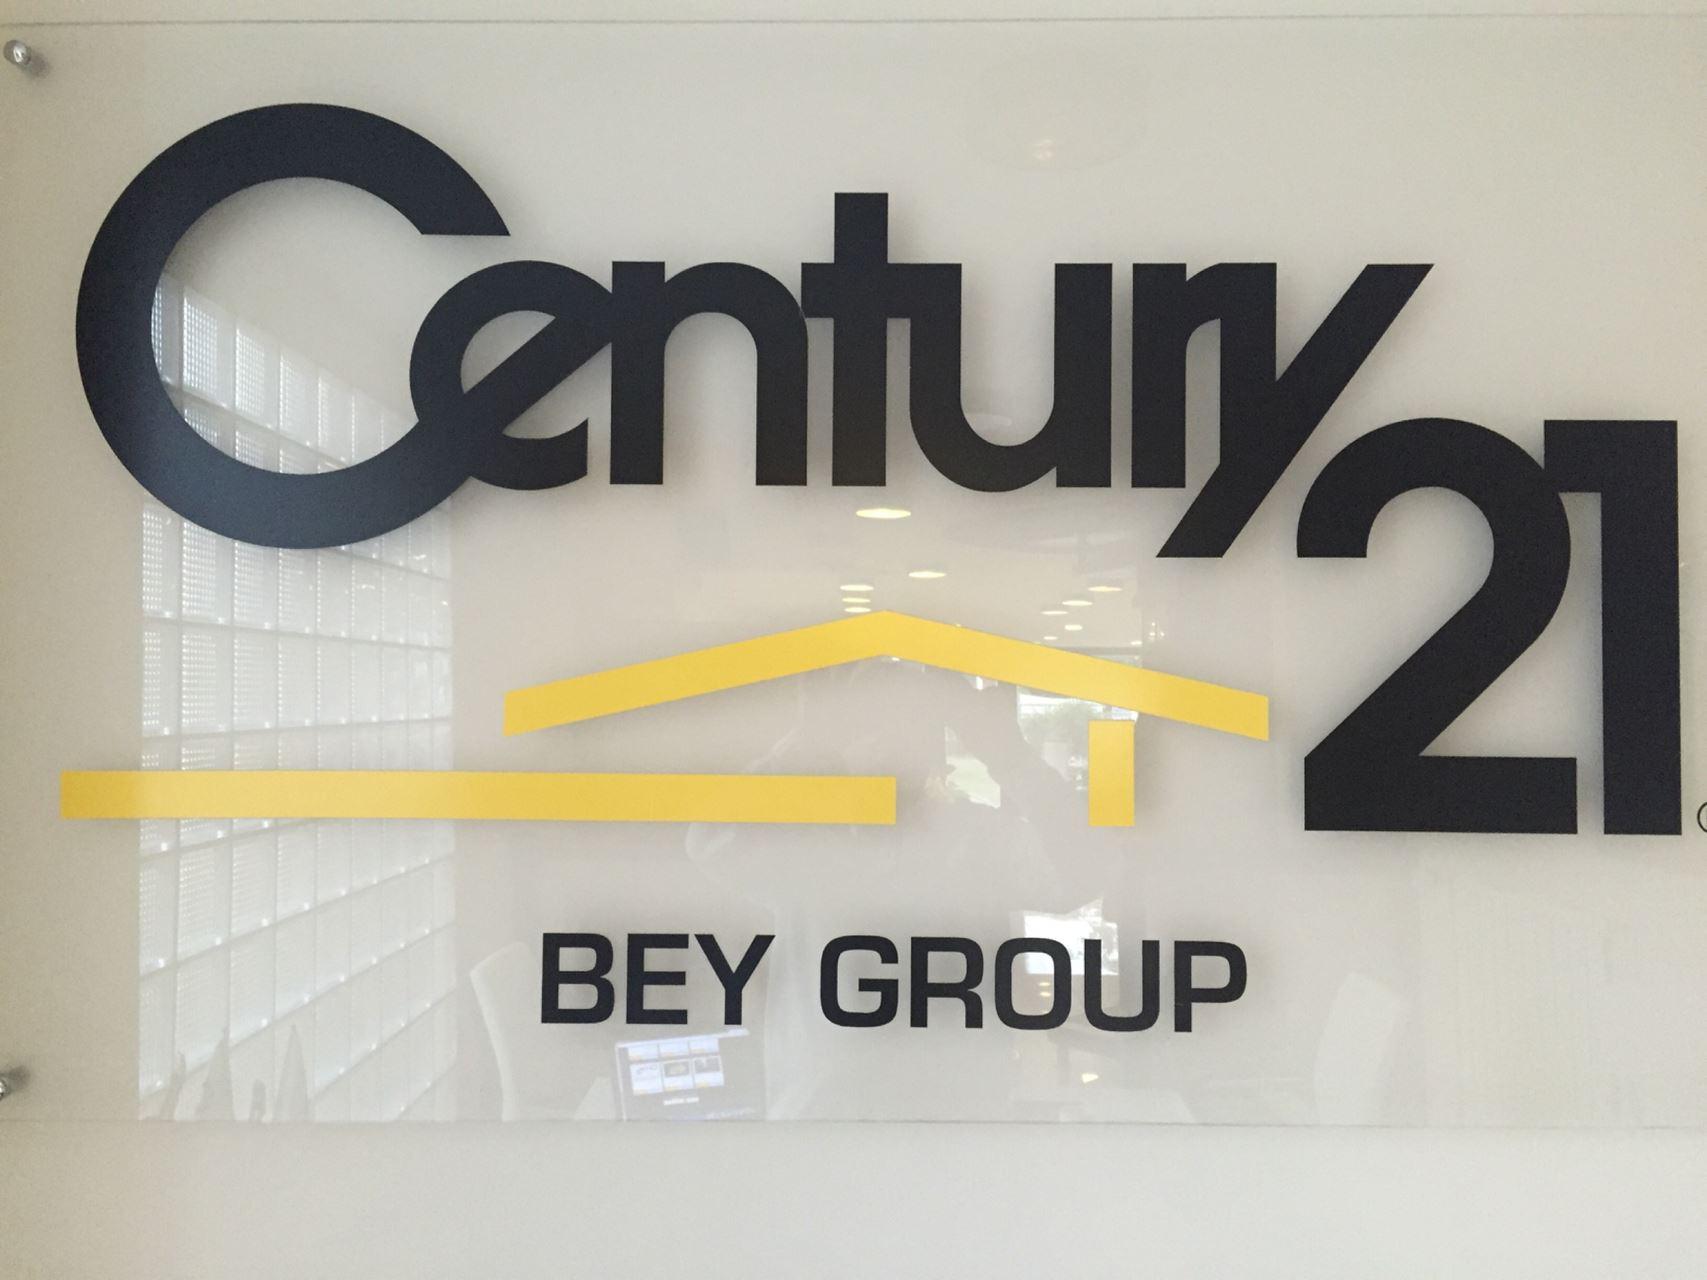 CENTURY 21 Bey Group Bahçeşehir